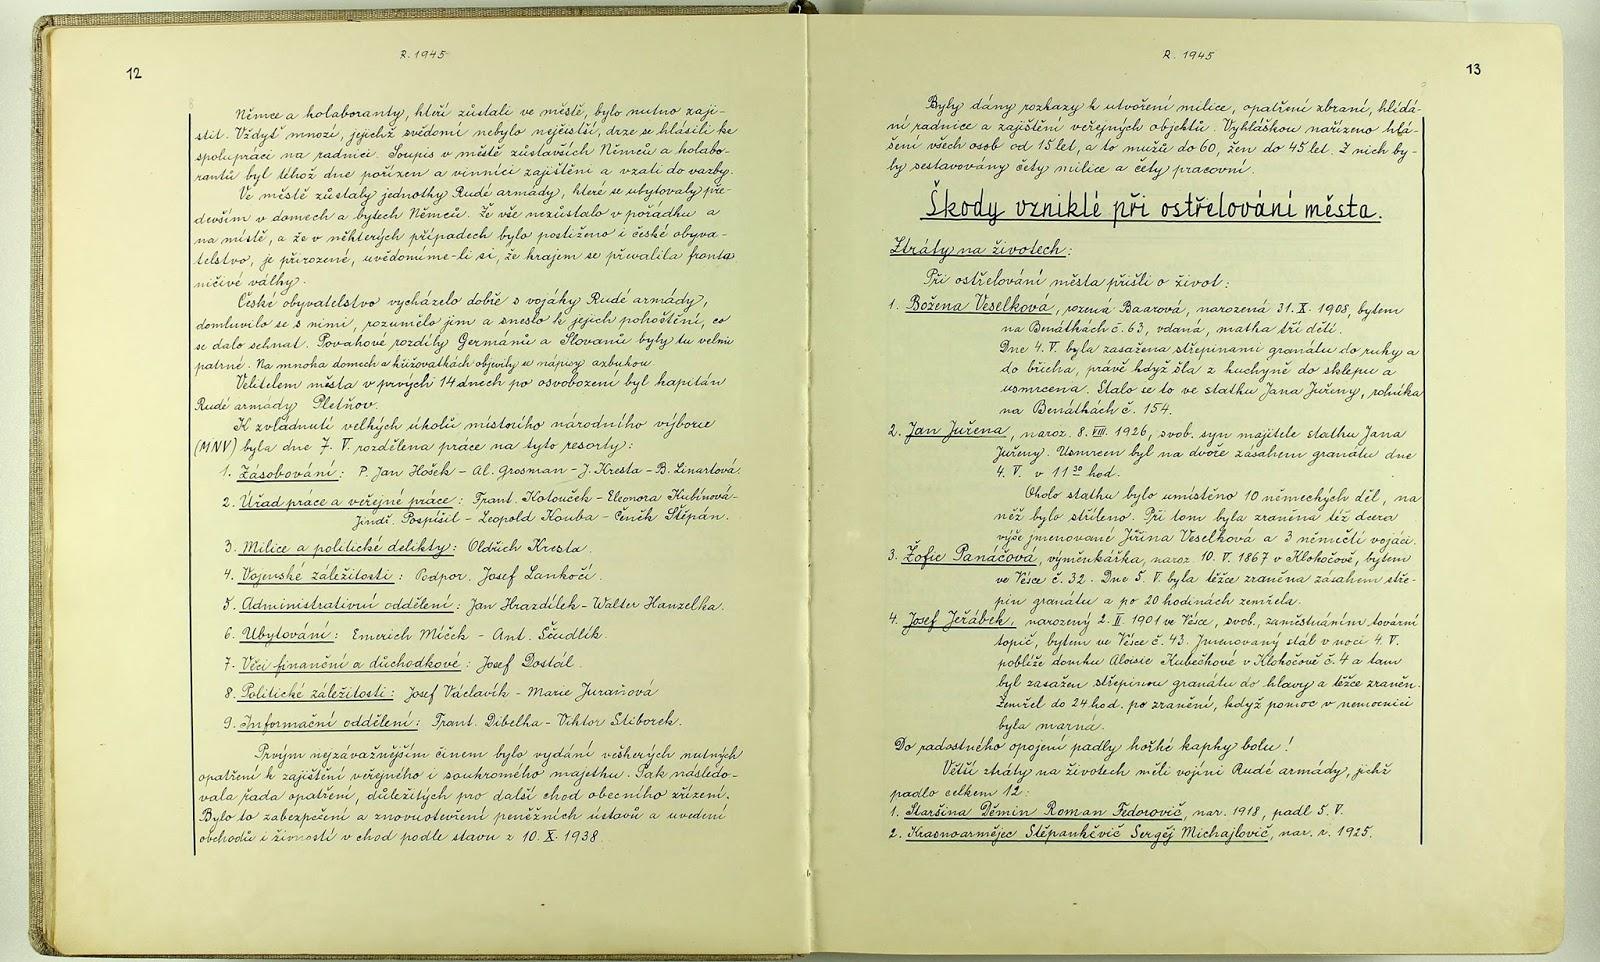 Летописи города Пршибор, 1945 год. Стр. 12-13